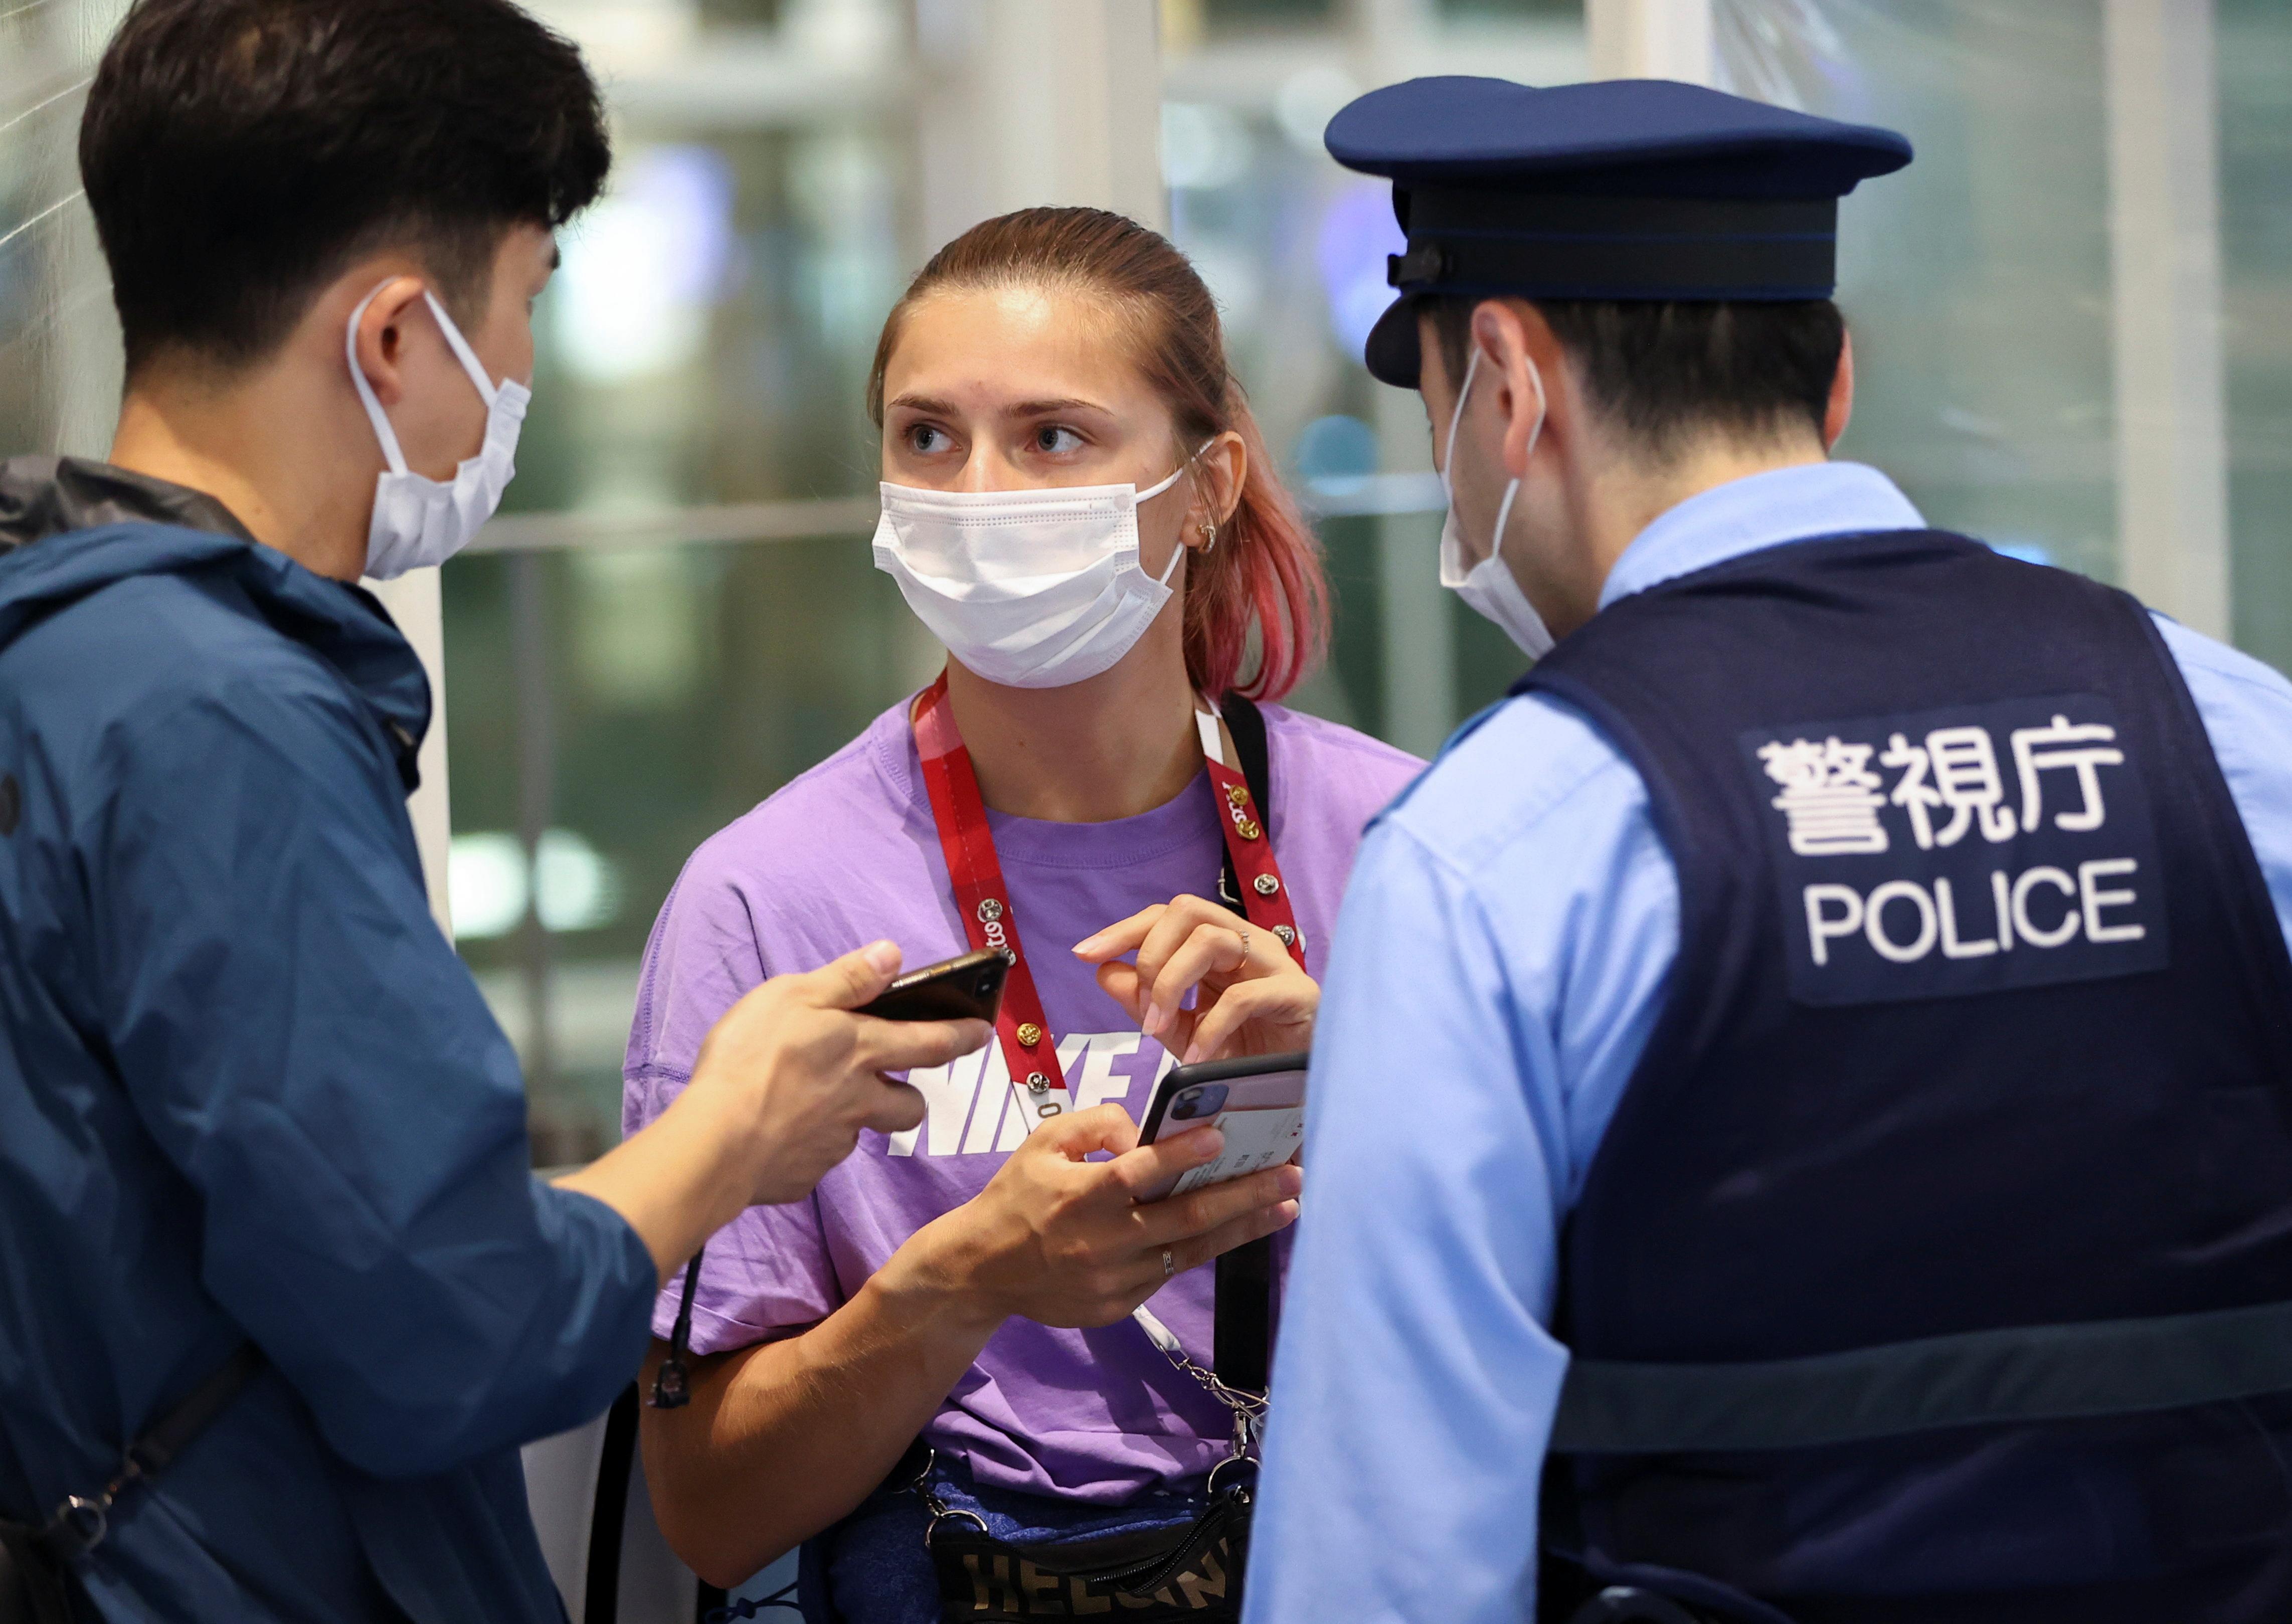 Belarusian athlete Krystsina Tsimanouskaya talks with a police officer at Haneda international airport in Tokyo, Japan August 1, 2021.  REUTERS/Issei Kato